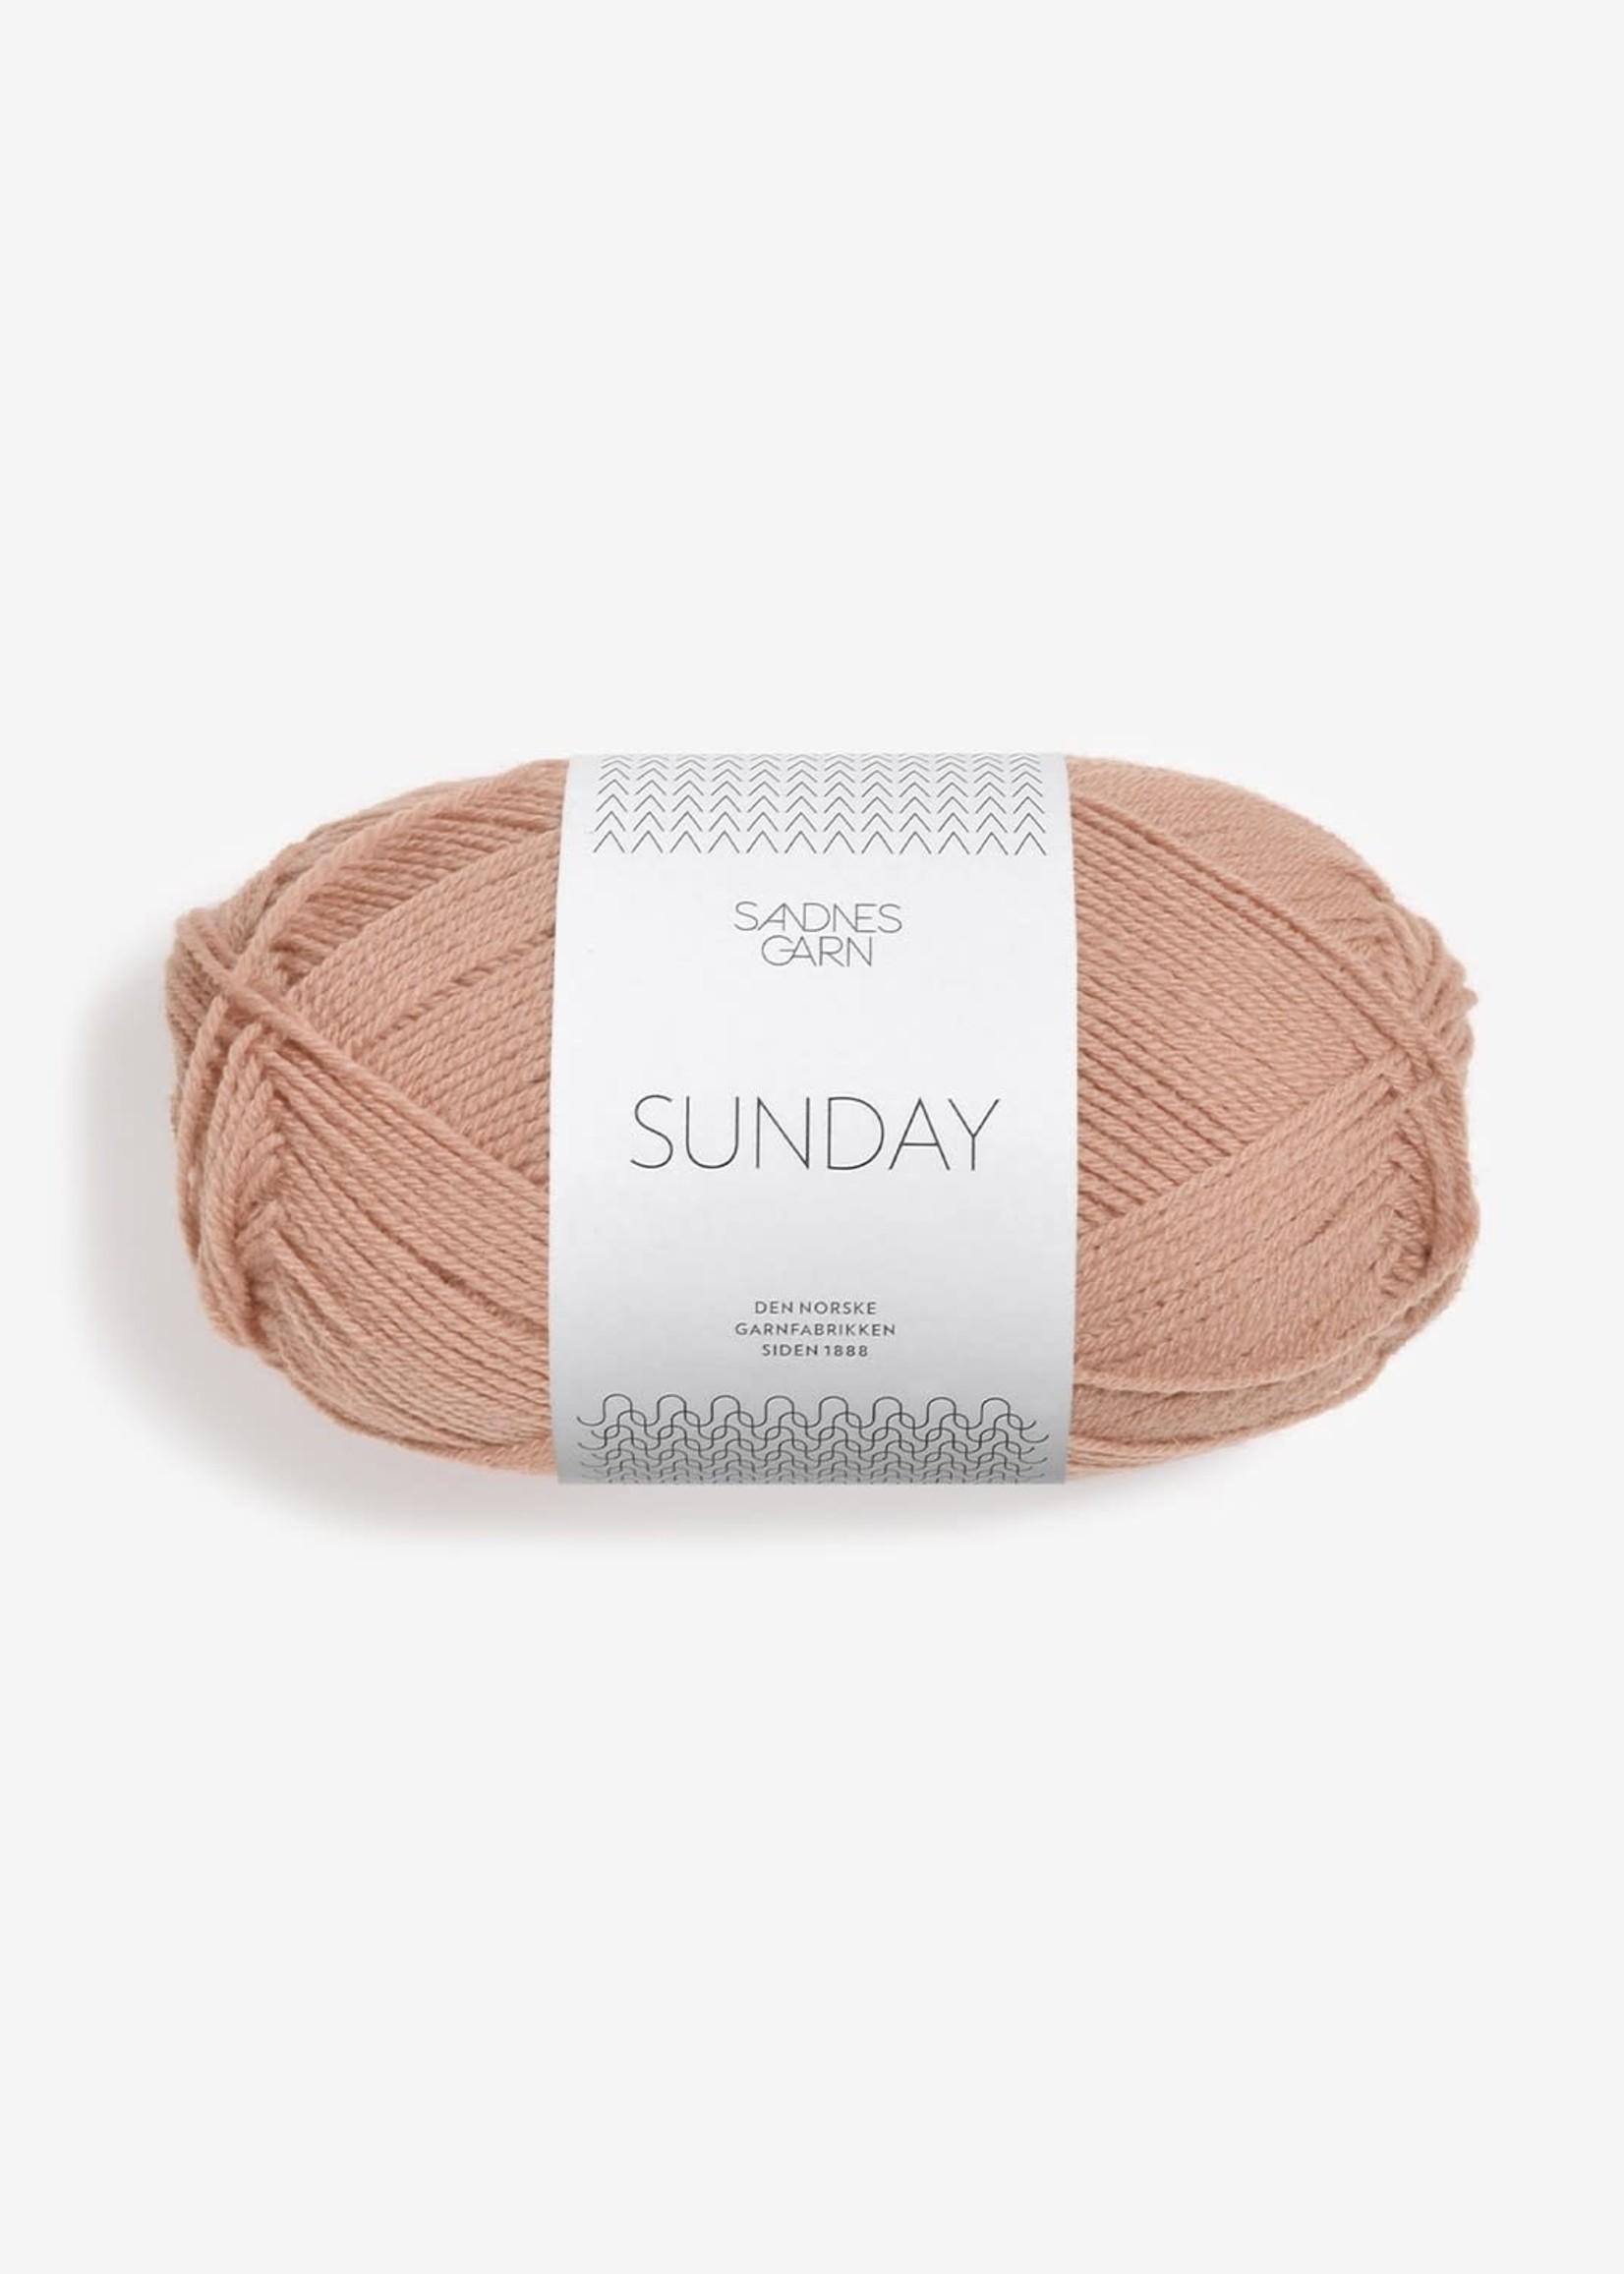 Sandnes Garn Sunday - #3532 Kame